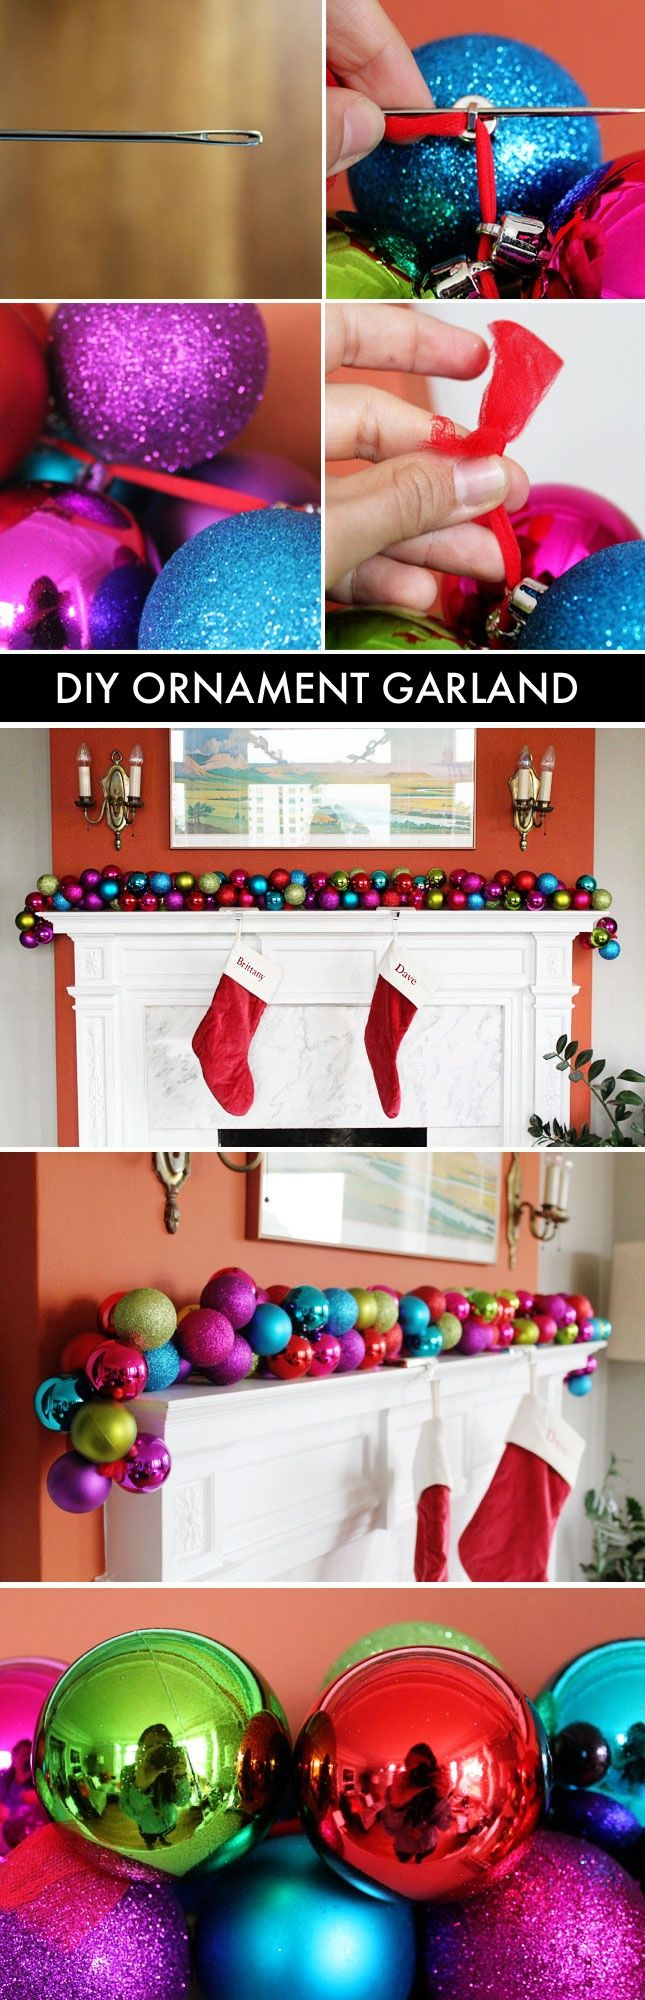 colorful ornament garland!